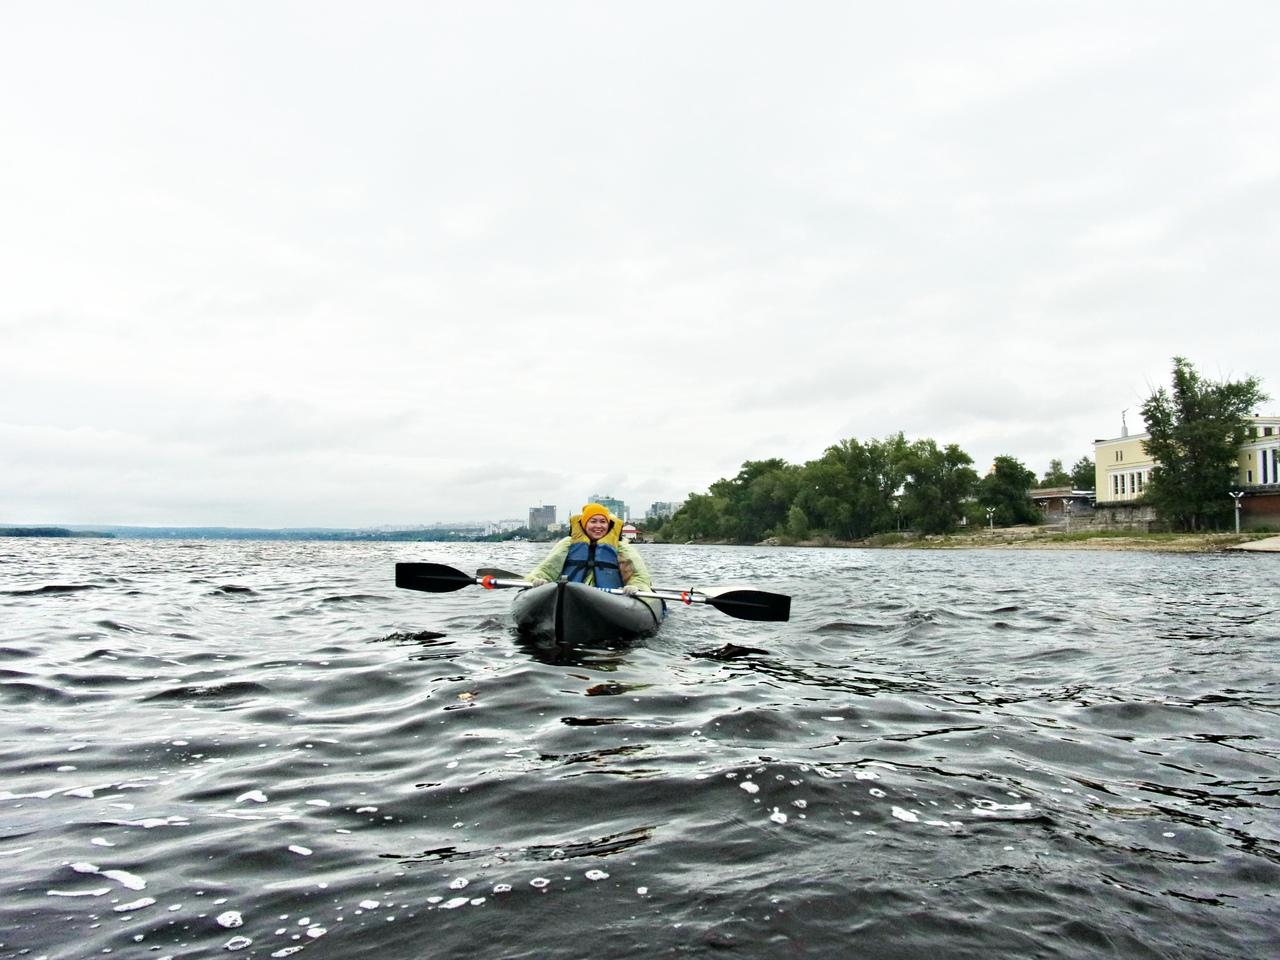 Афиша Самара Сплав по реке Волга вдоль берегов Самары 9.08.20